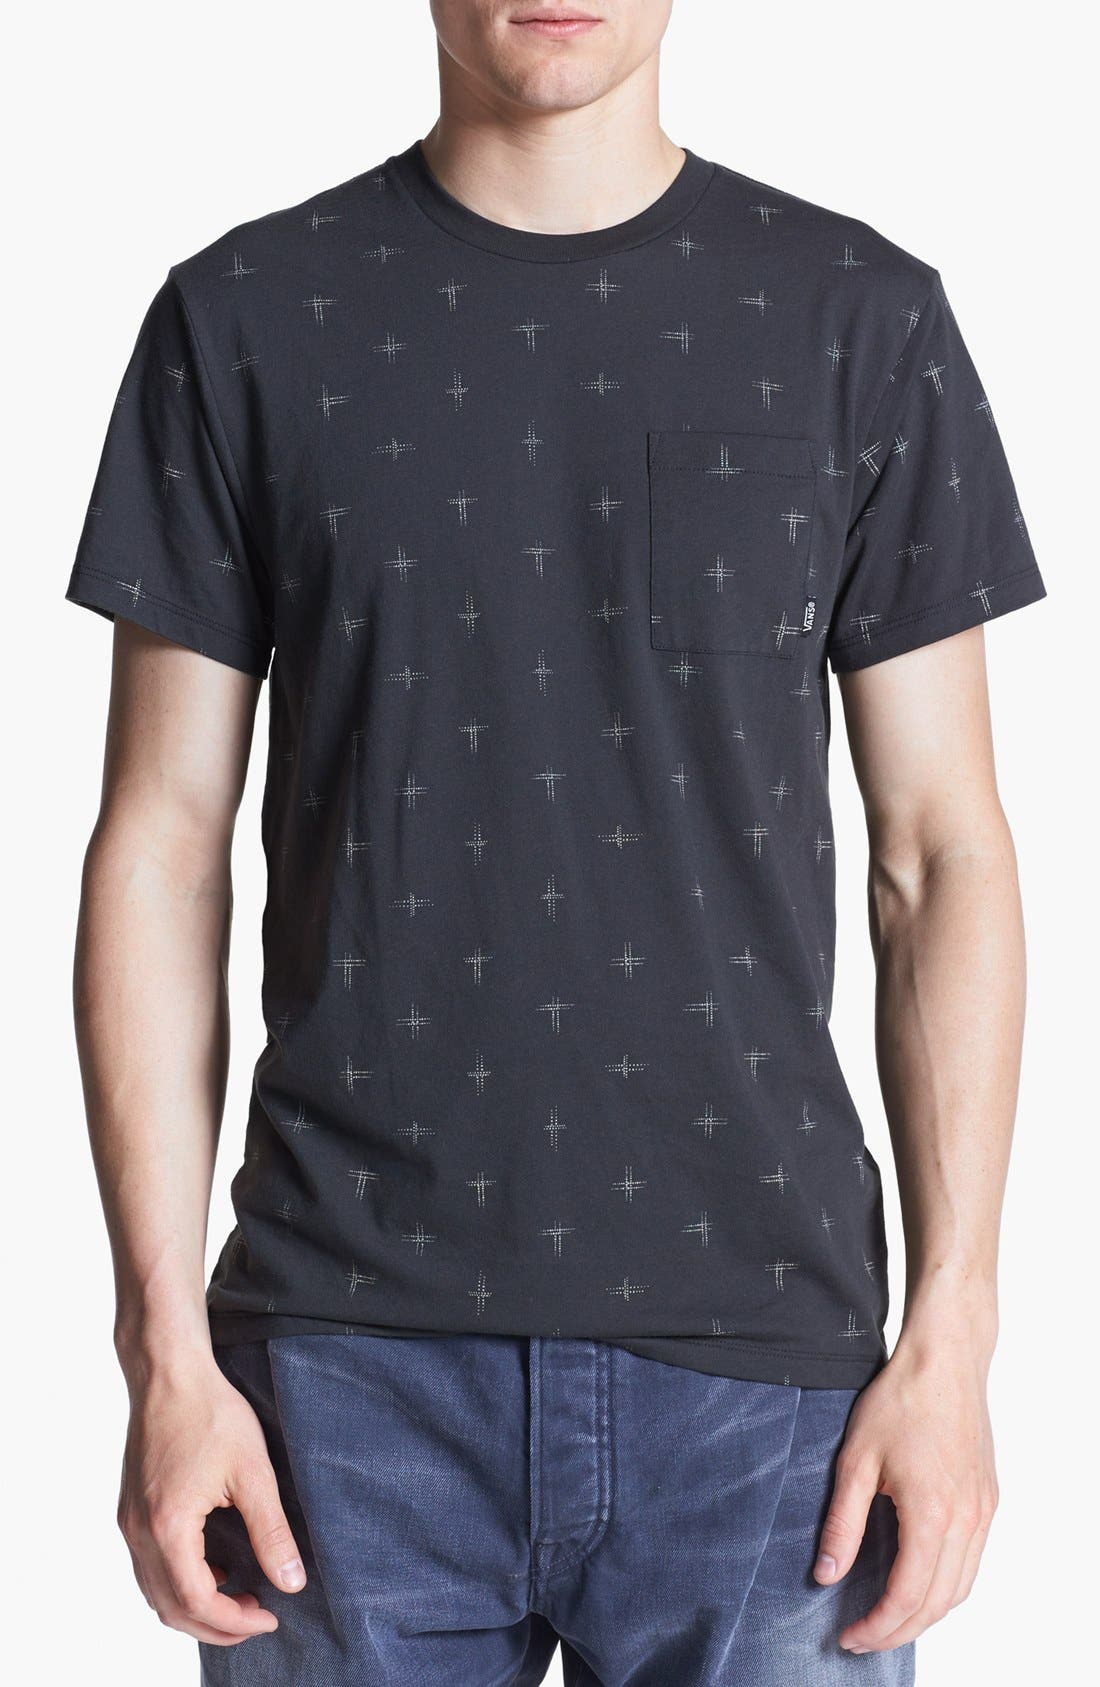 Alternate Image 1 Selected - Vans 'Noughts' Print T-Shirt